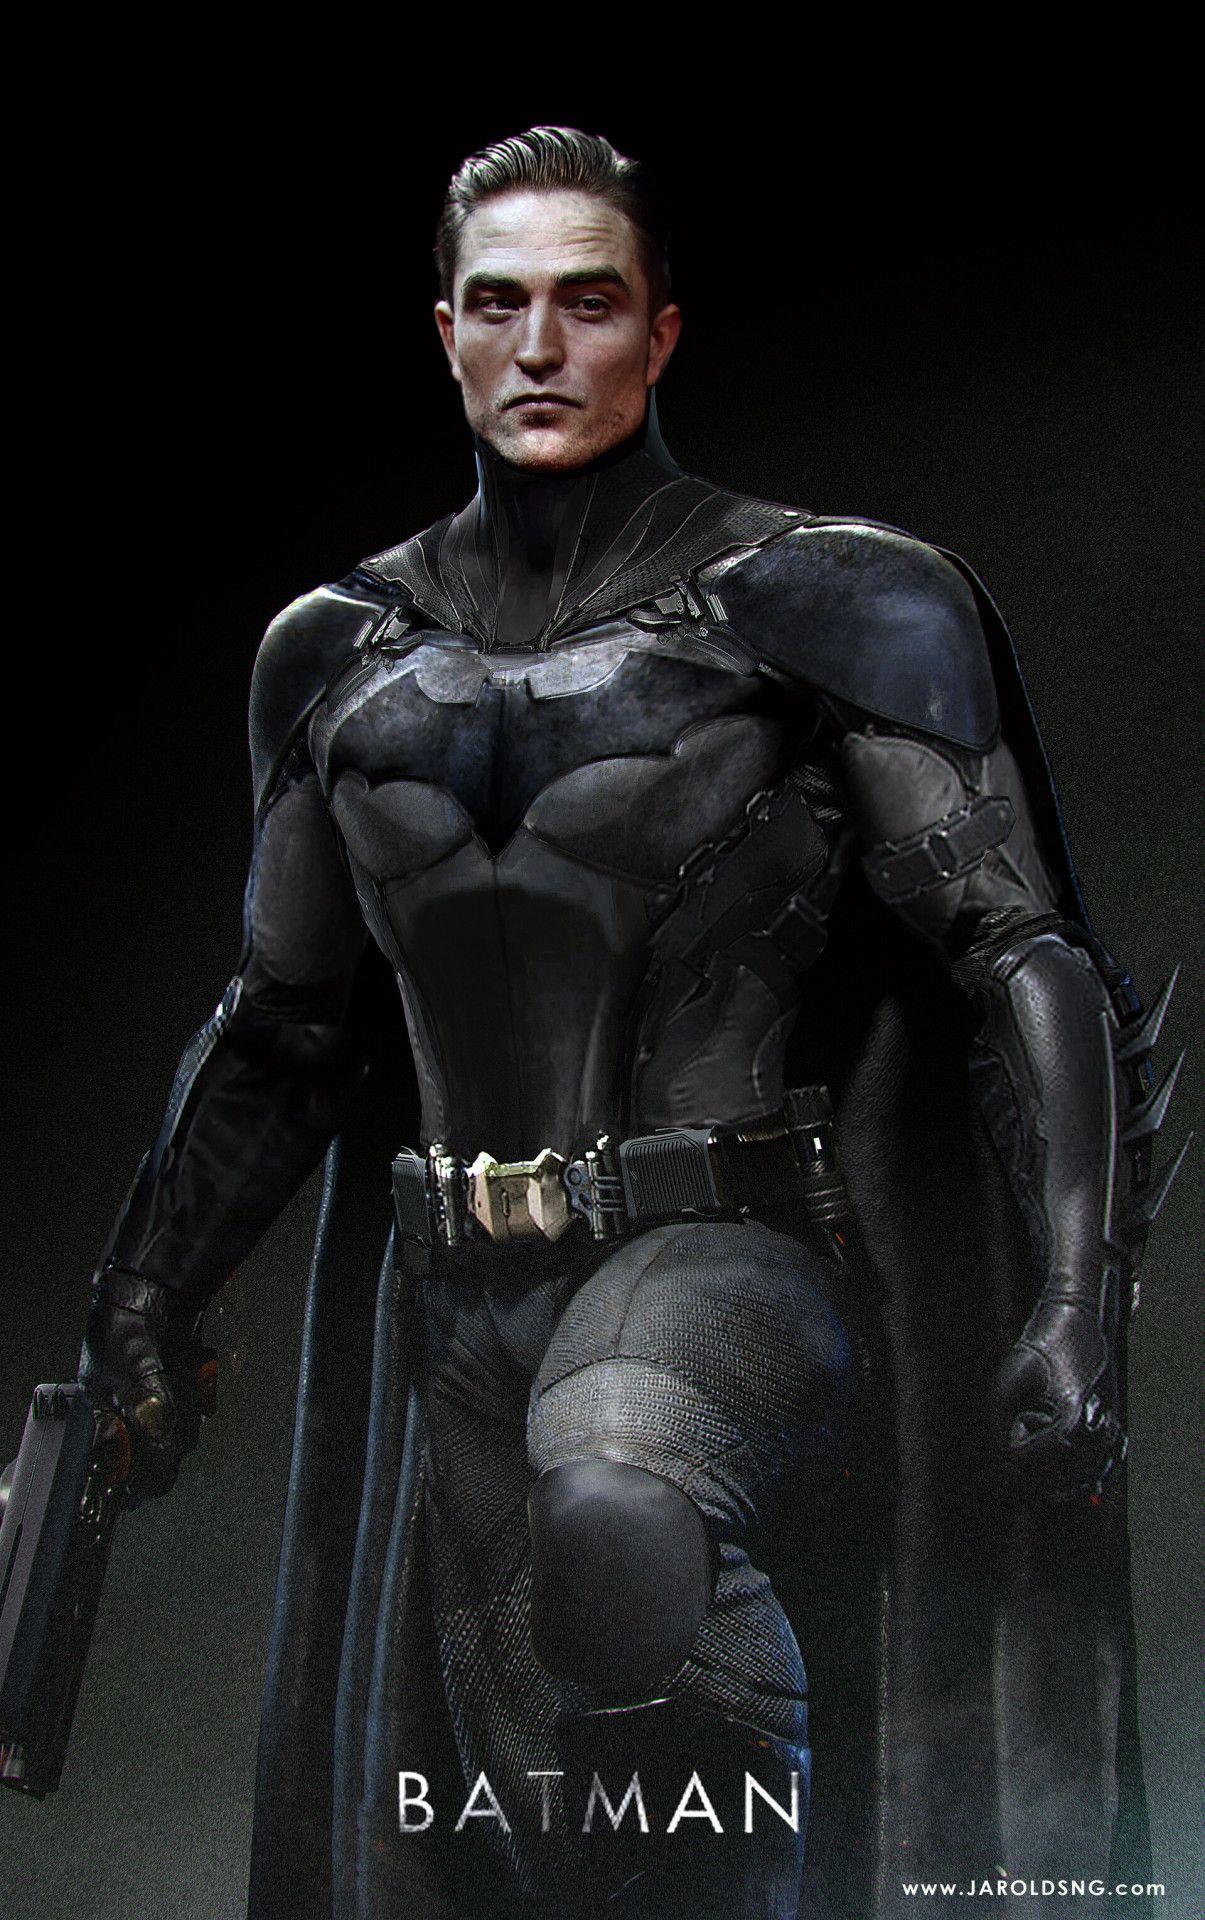 BATMAN NOTES — Batman Concept Art Robert Pattinson in ...